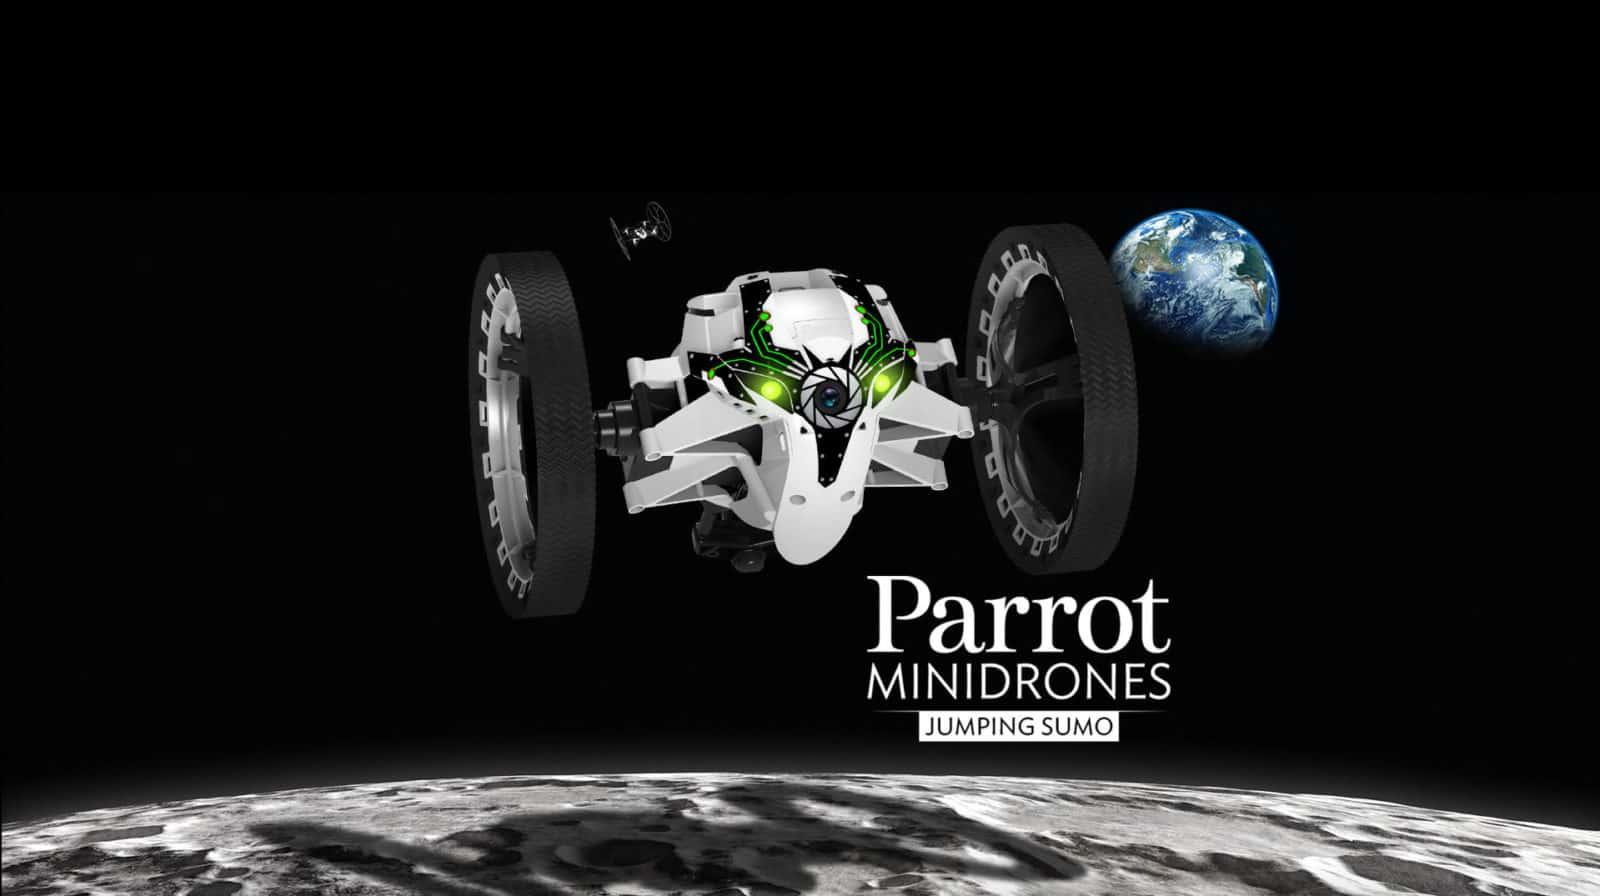 Jumping Sumo minidrone